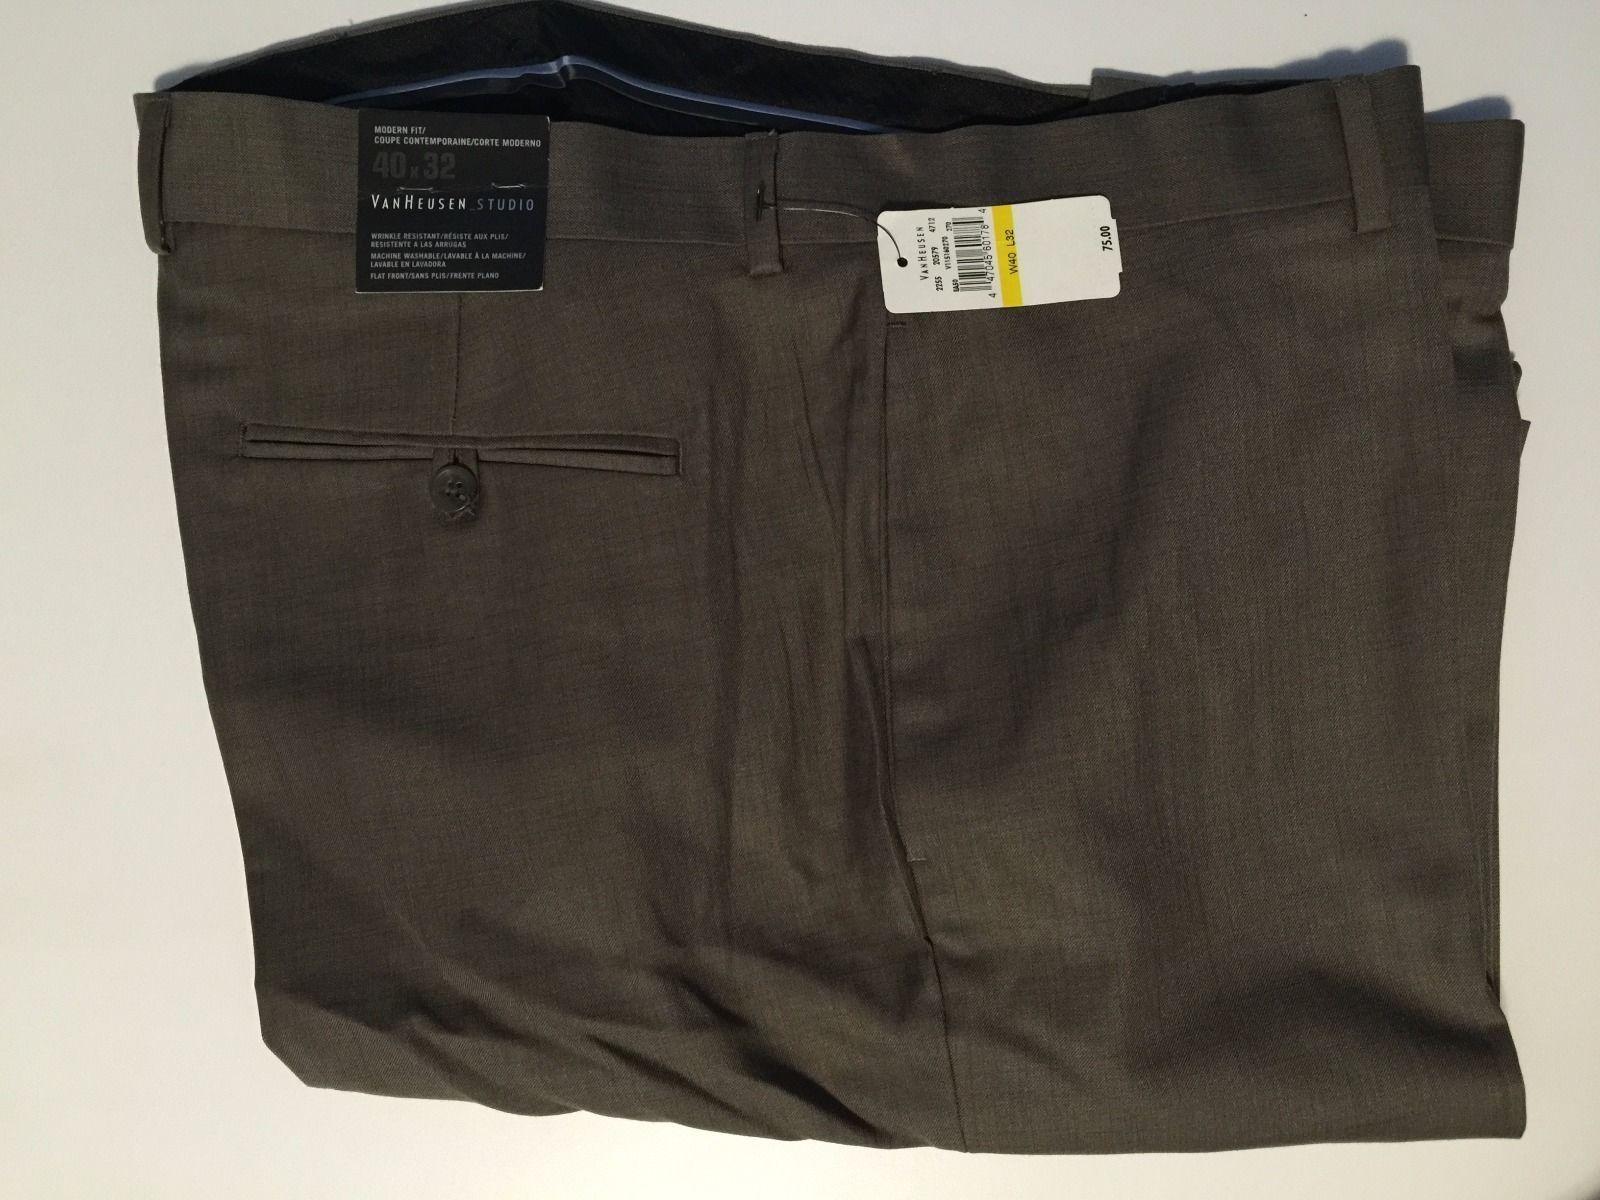 Van heusen studio modern fit flat front casual pants w40 for Van heusen studio shirts big and tall